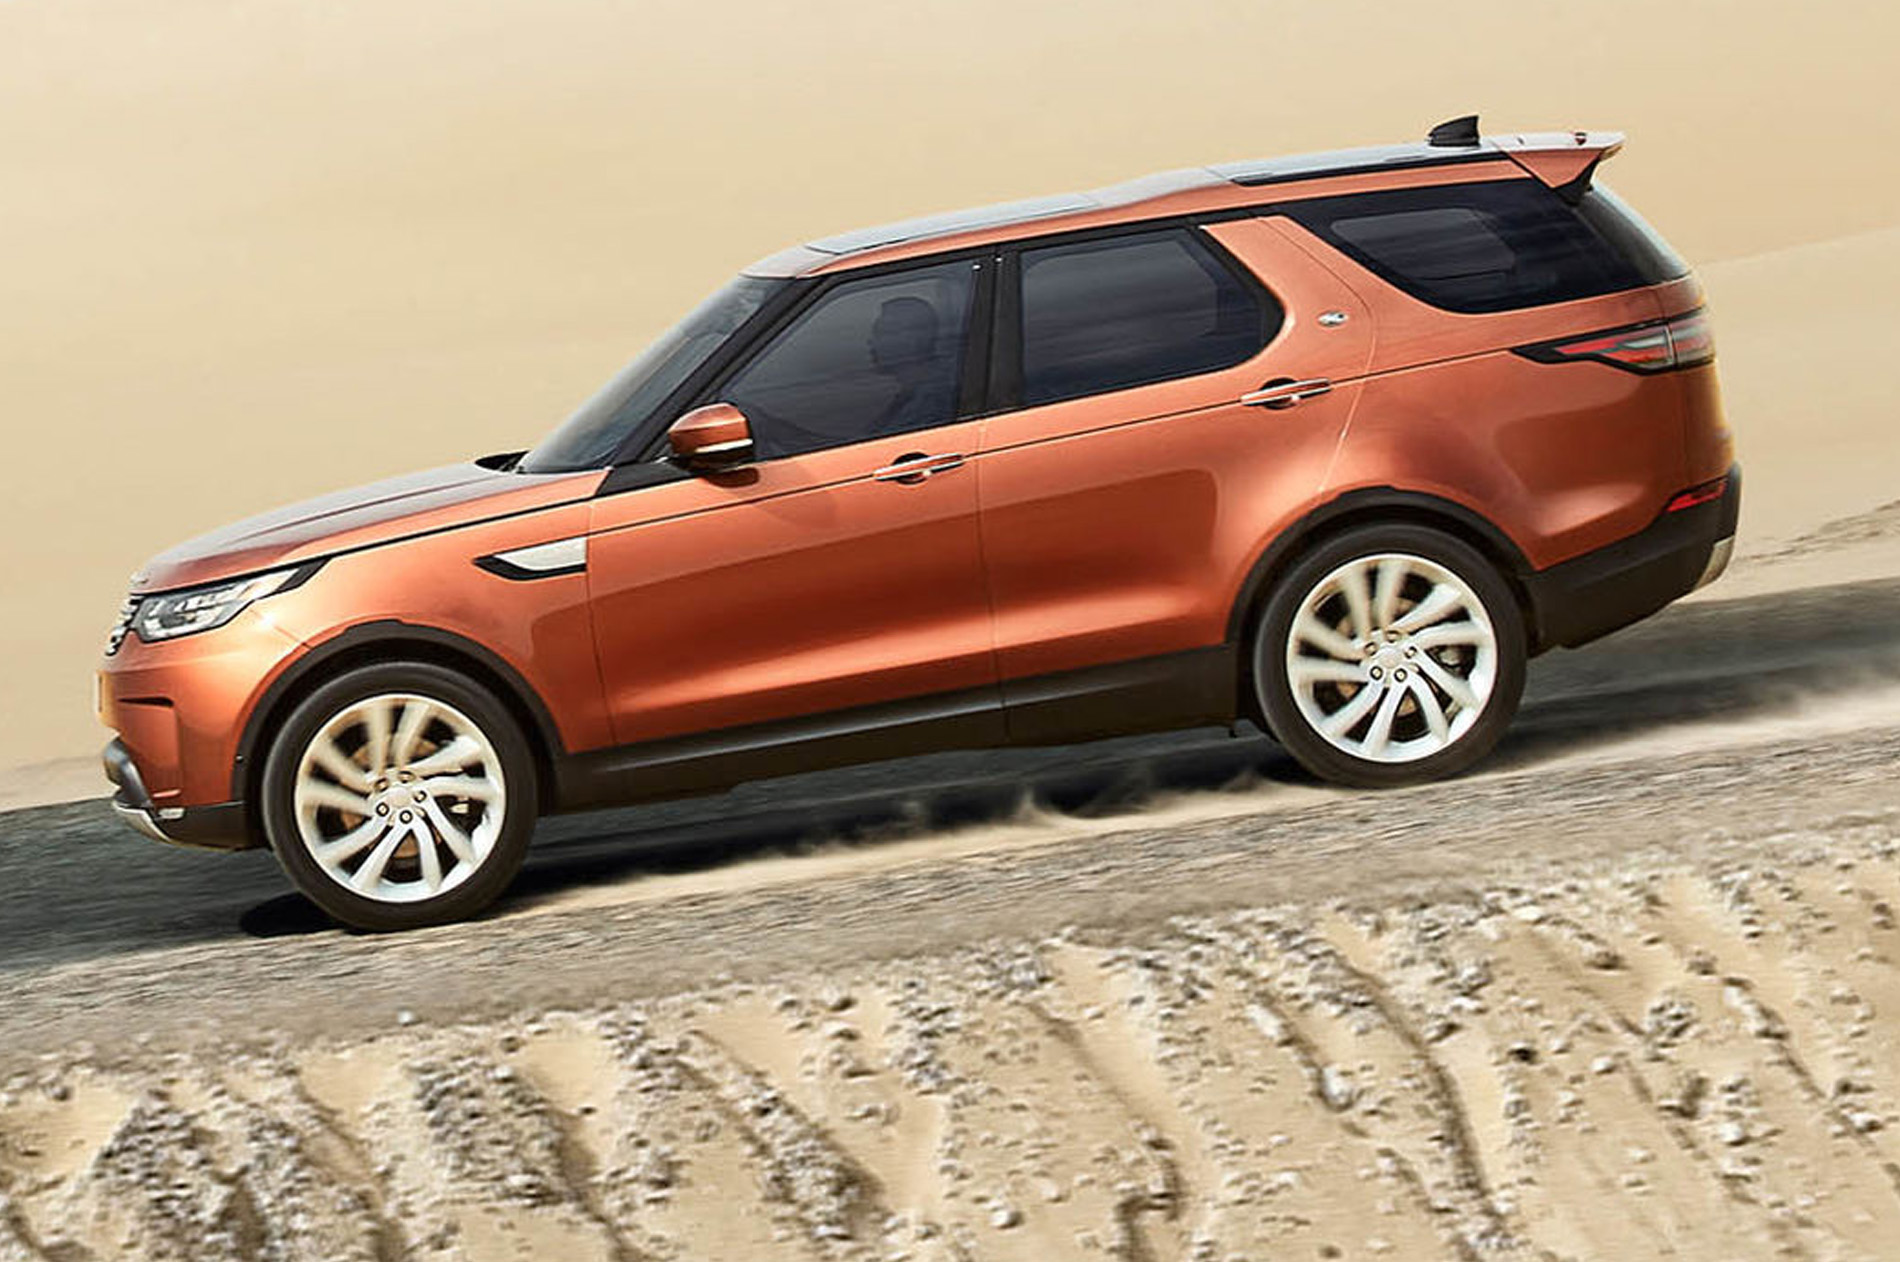 2018-Land-Rover-Discovery-UK-Photos.jpg